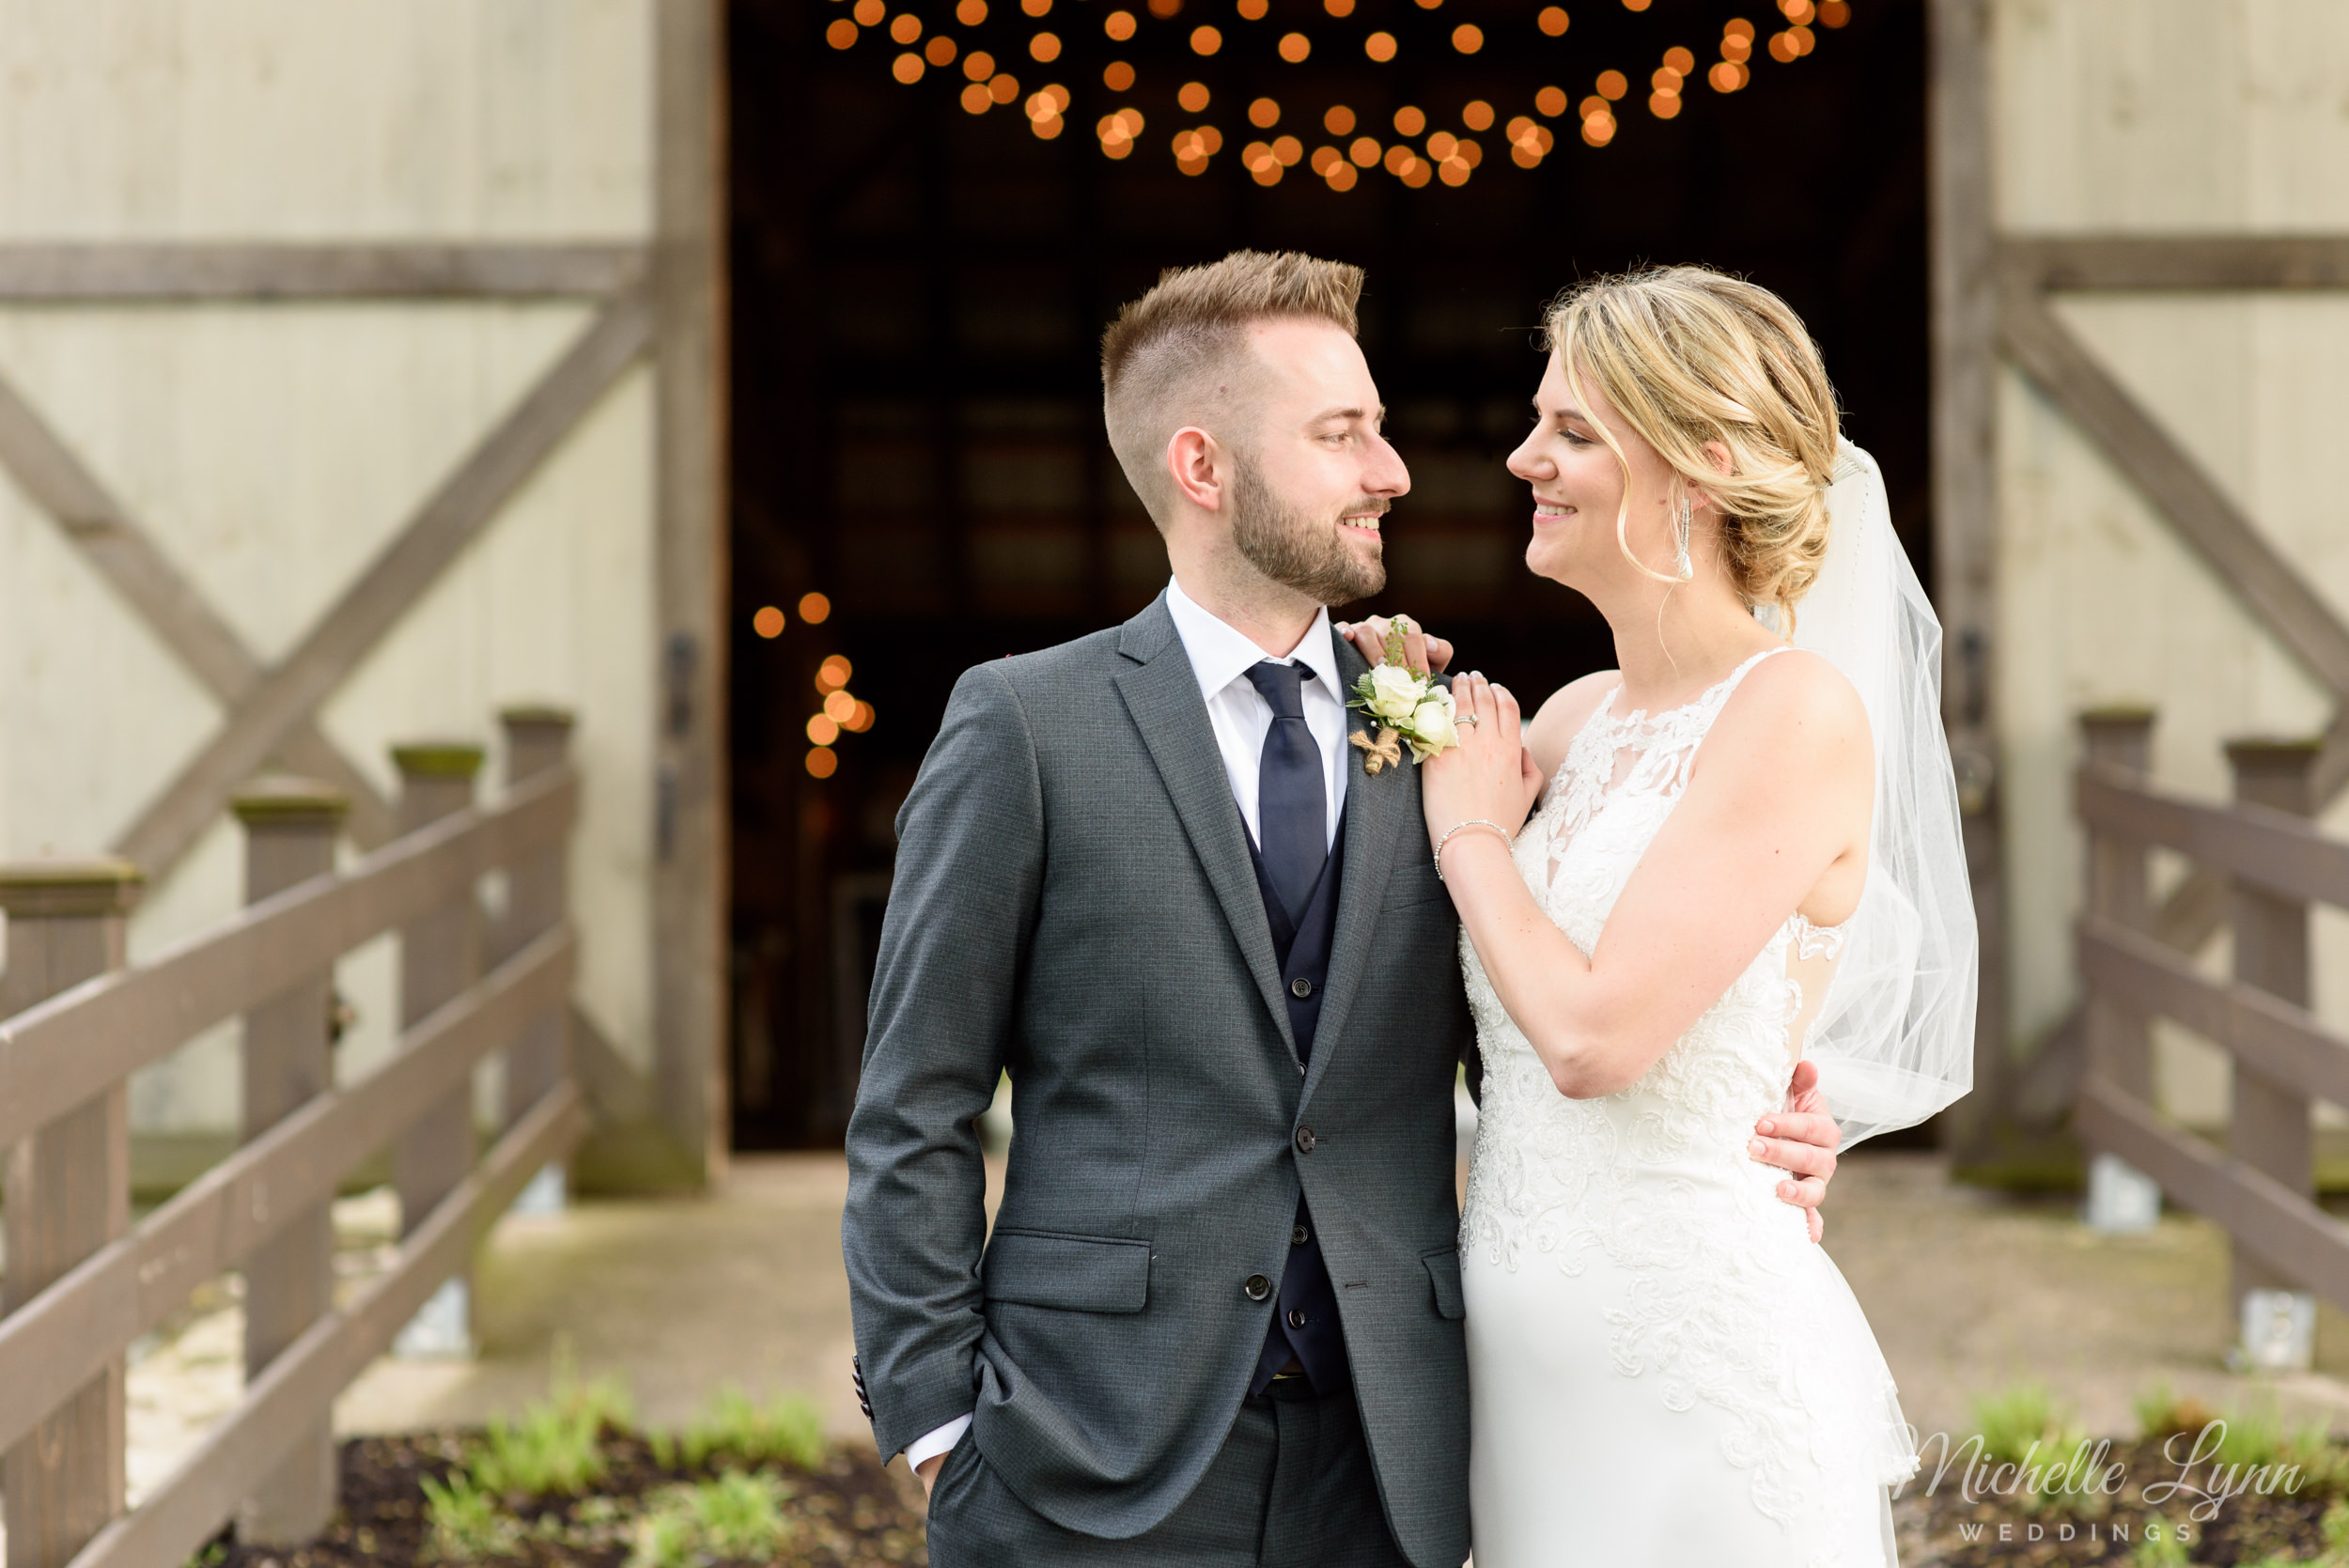 mlw-the-farm-bakery-and-events-wedding-photos-1.jpg